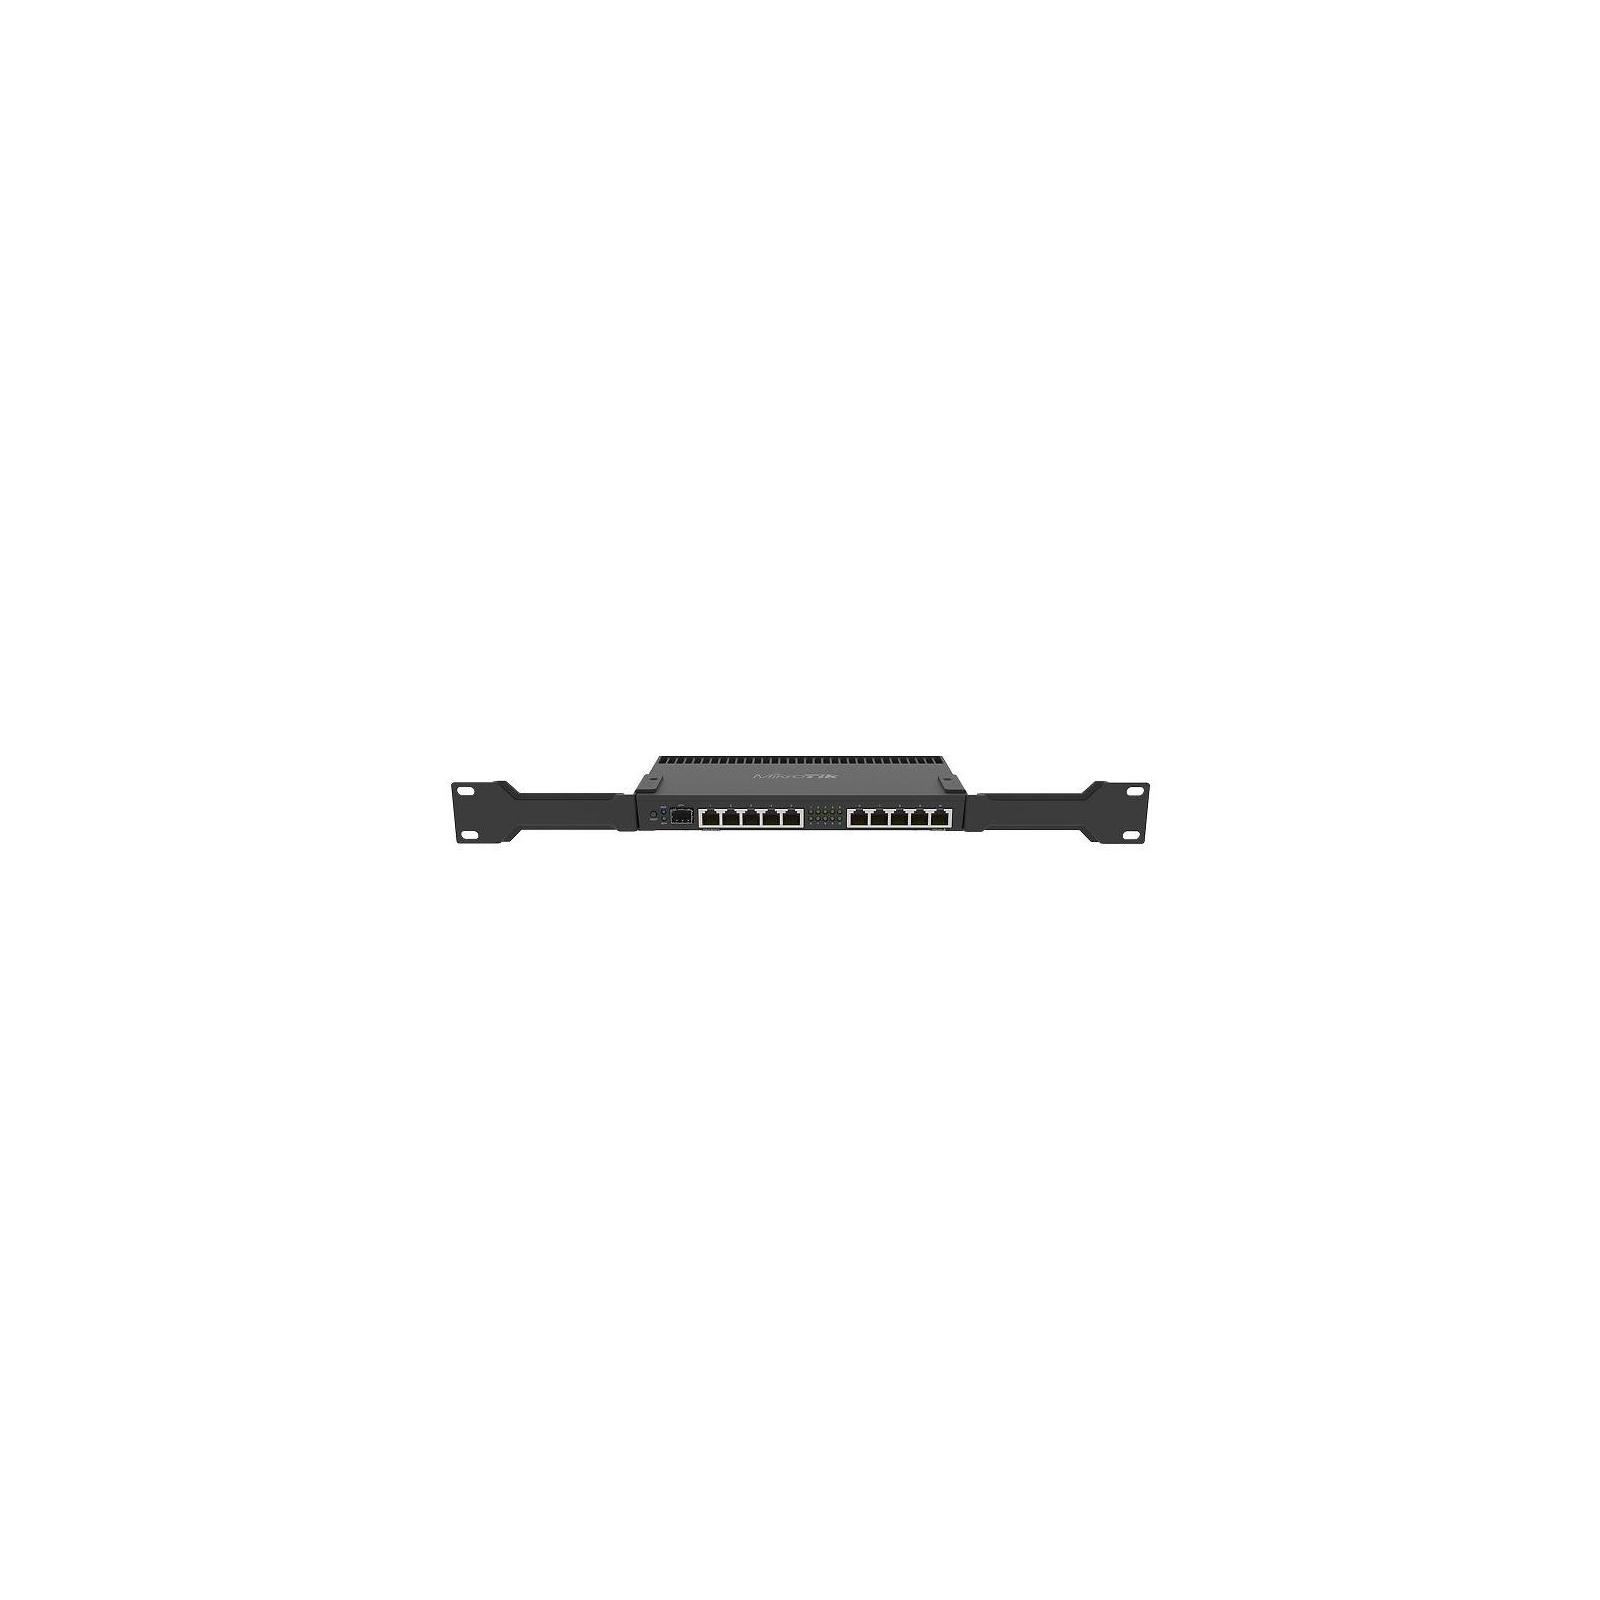 Маршрутизатор Mikrotik RB4011iGS+RM изображение 3